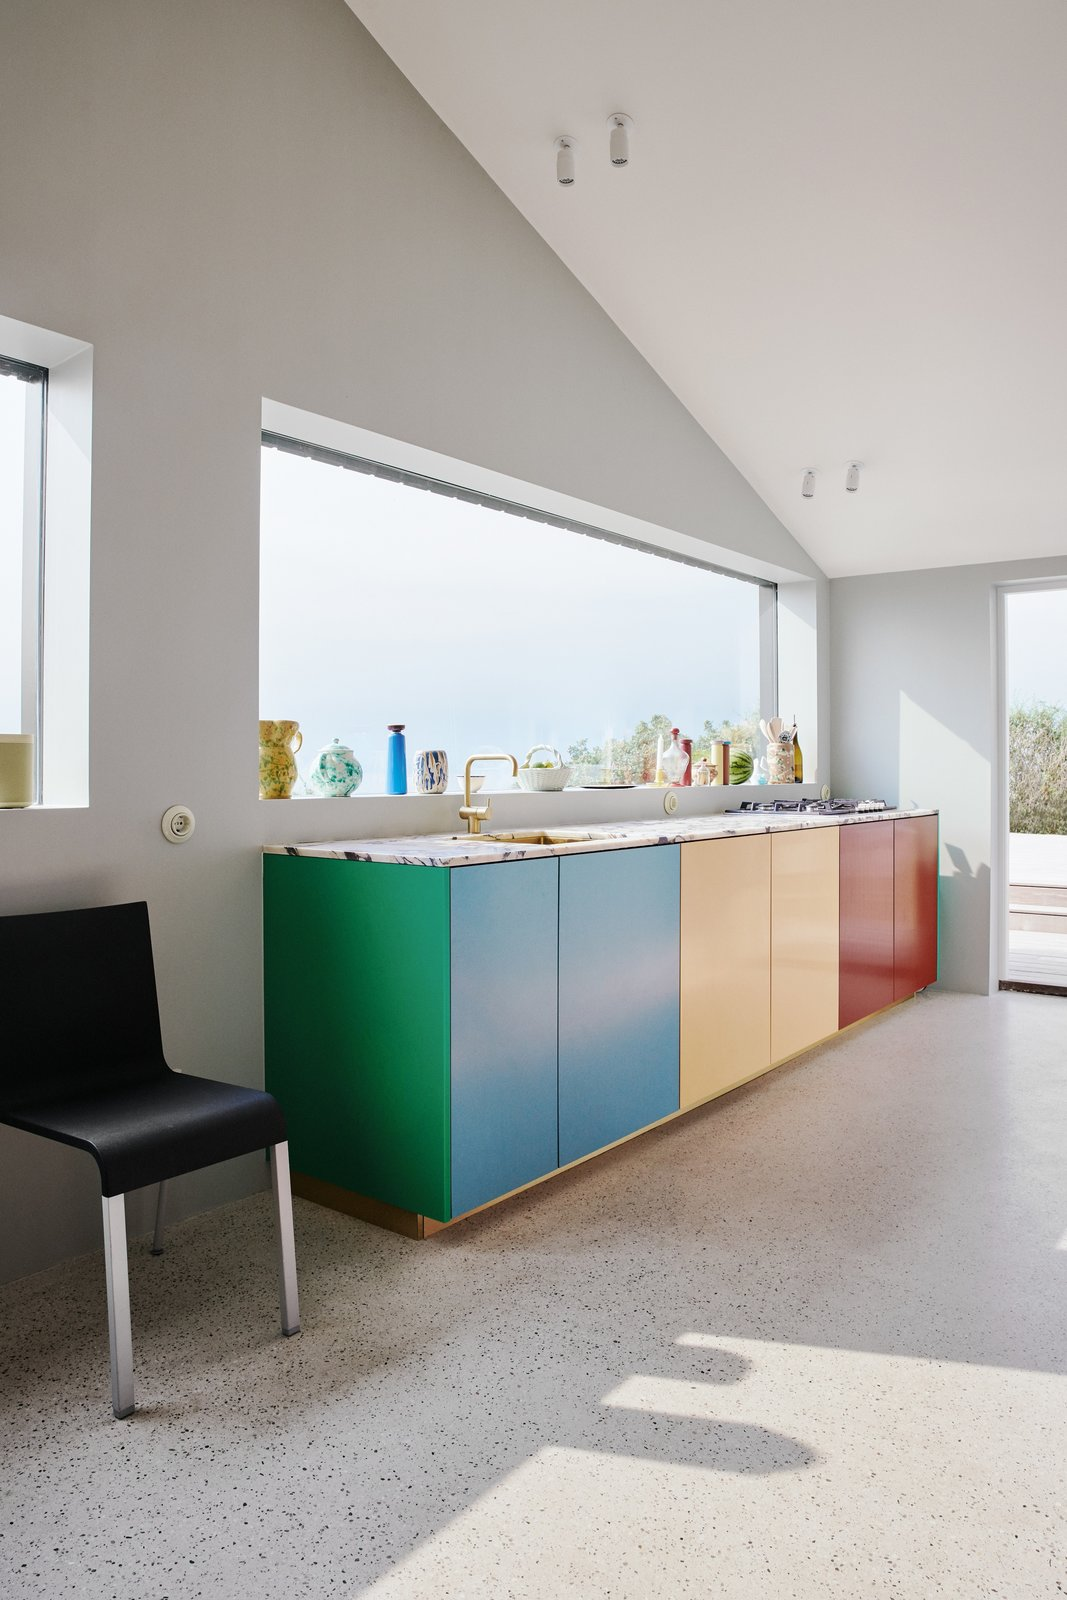 Match Kitchen By Muller Van Severen For Reform Dwell